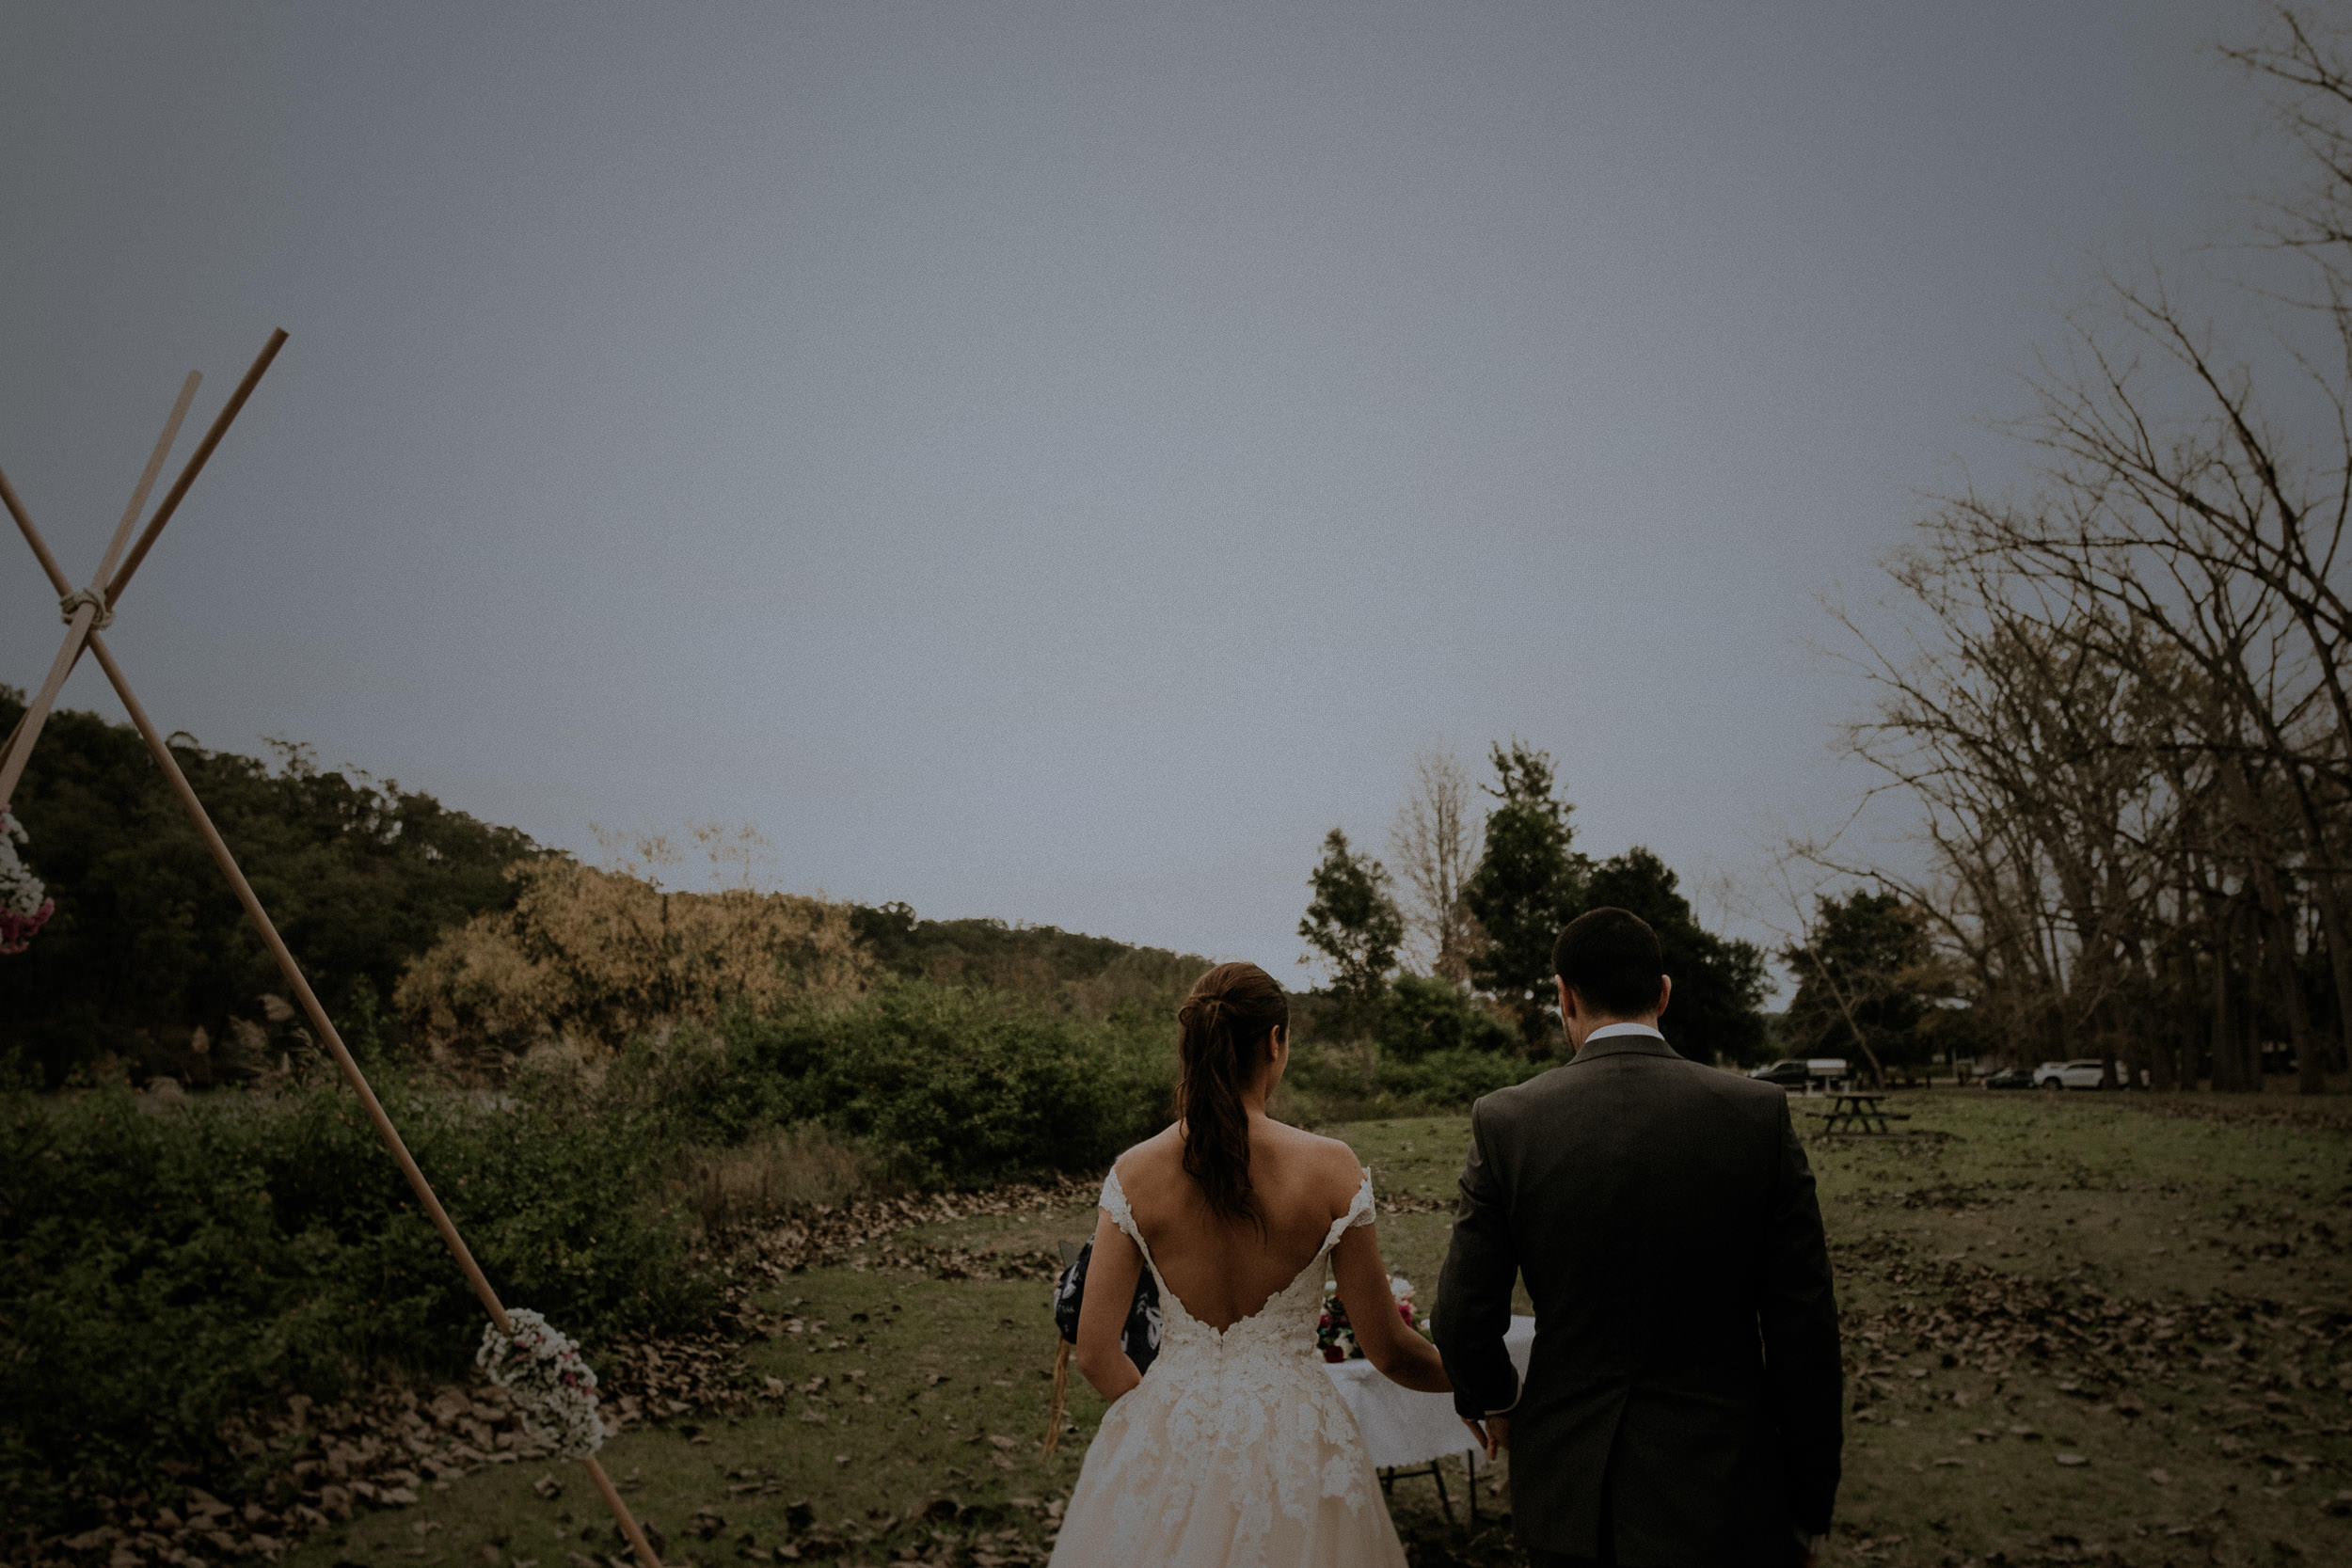 g_c wedding - kings _ thieves elopement wedding photography - blog 44.jpg